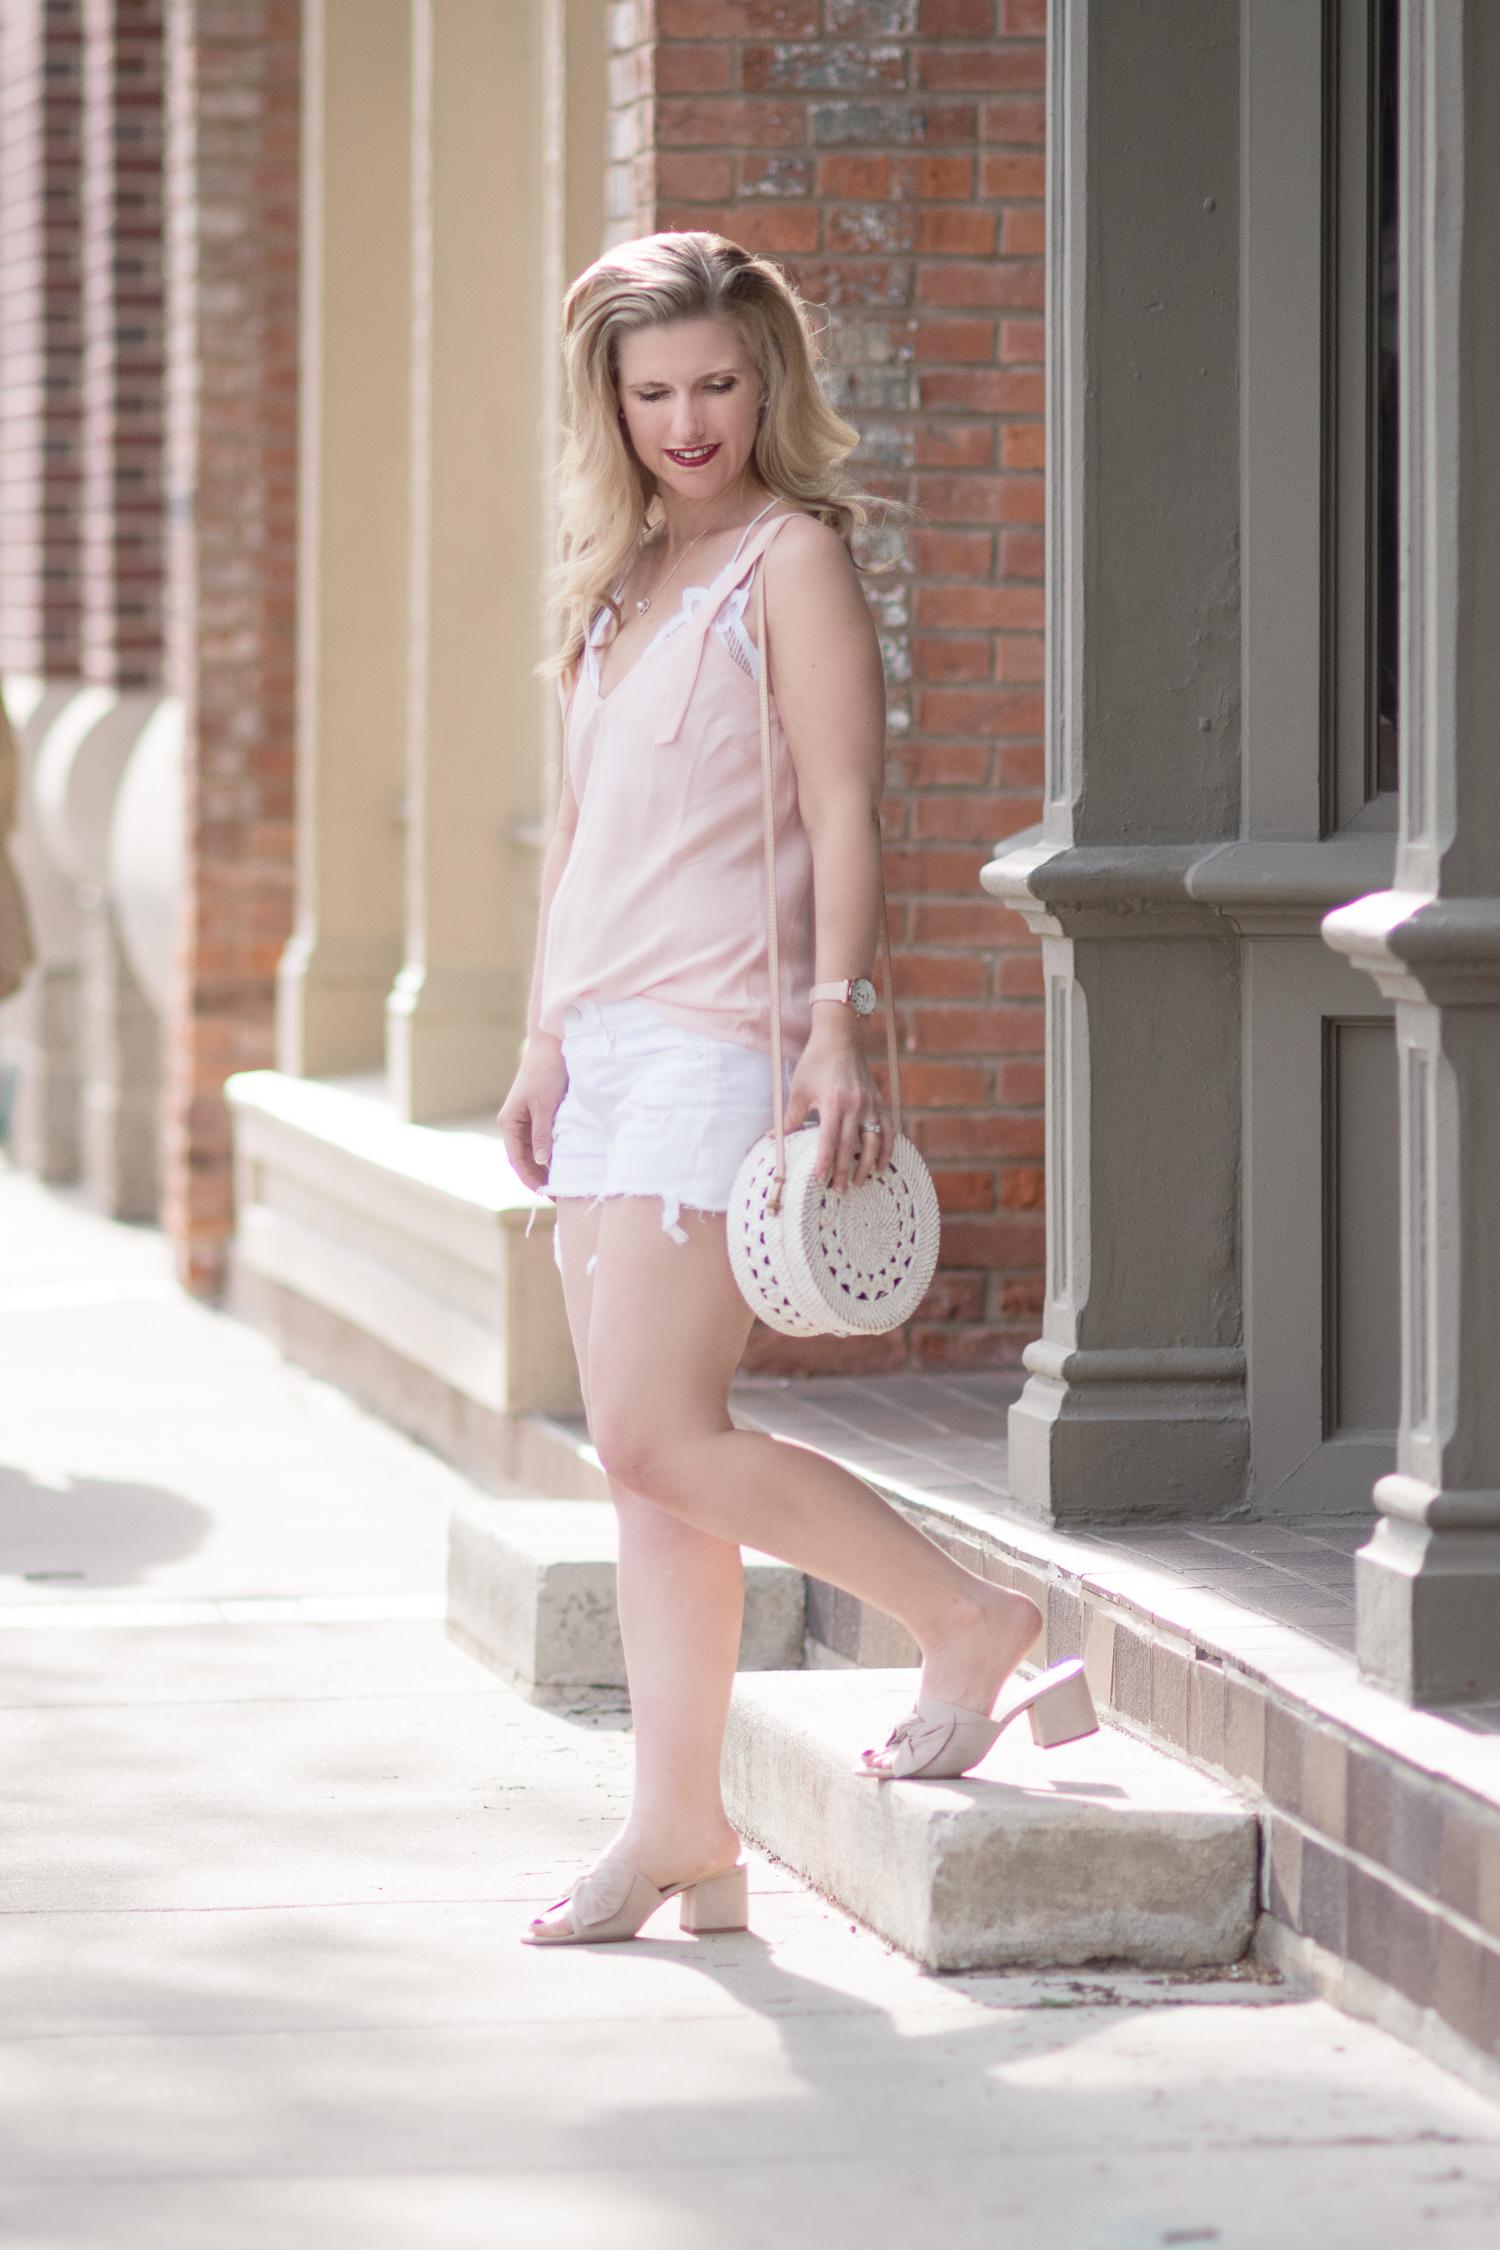 677e8f09d3 Michigan Petite Fashion and Lifestyle Blog